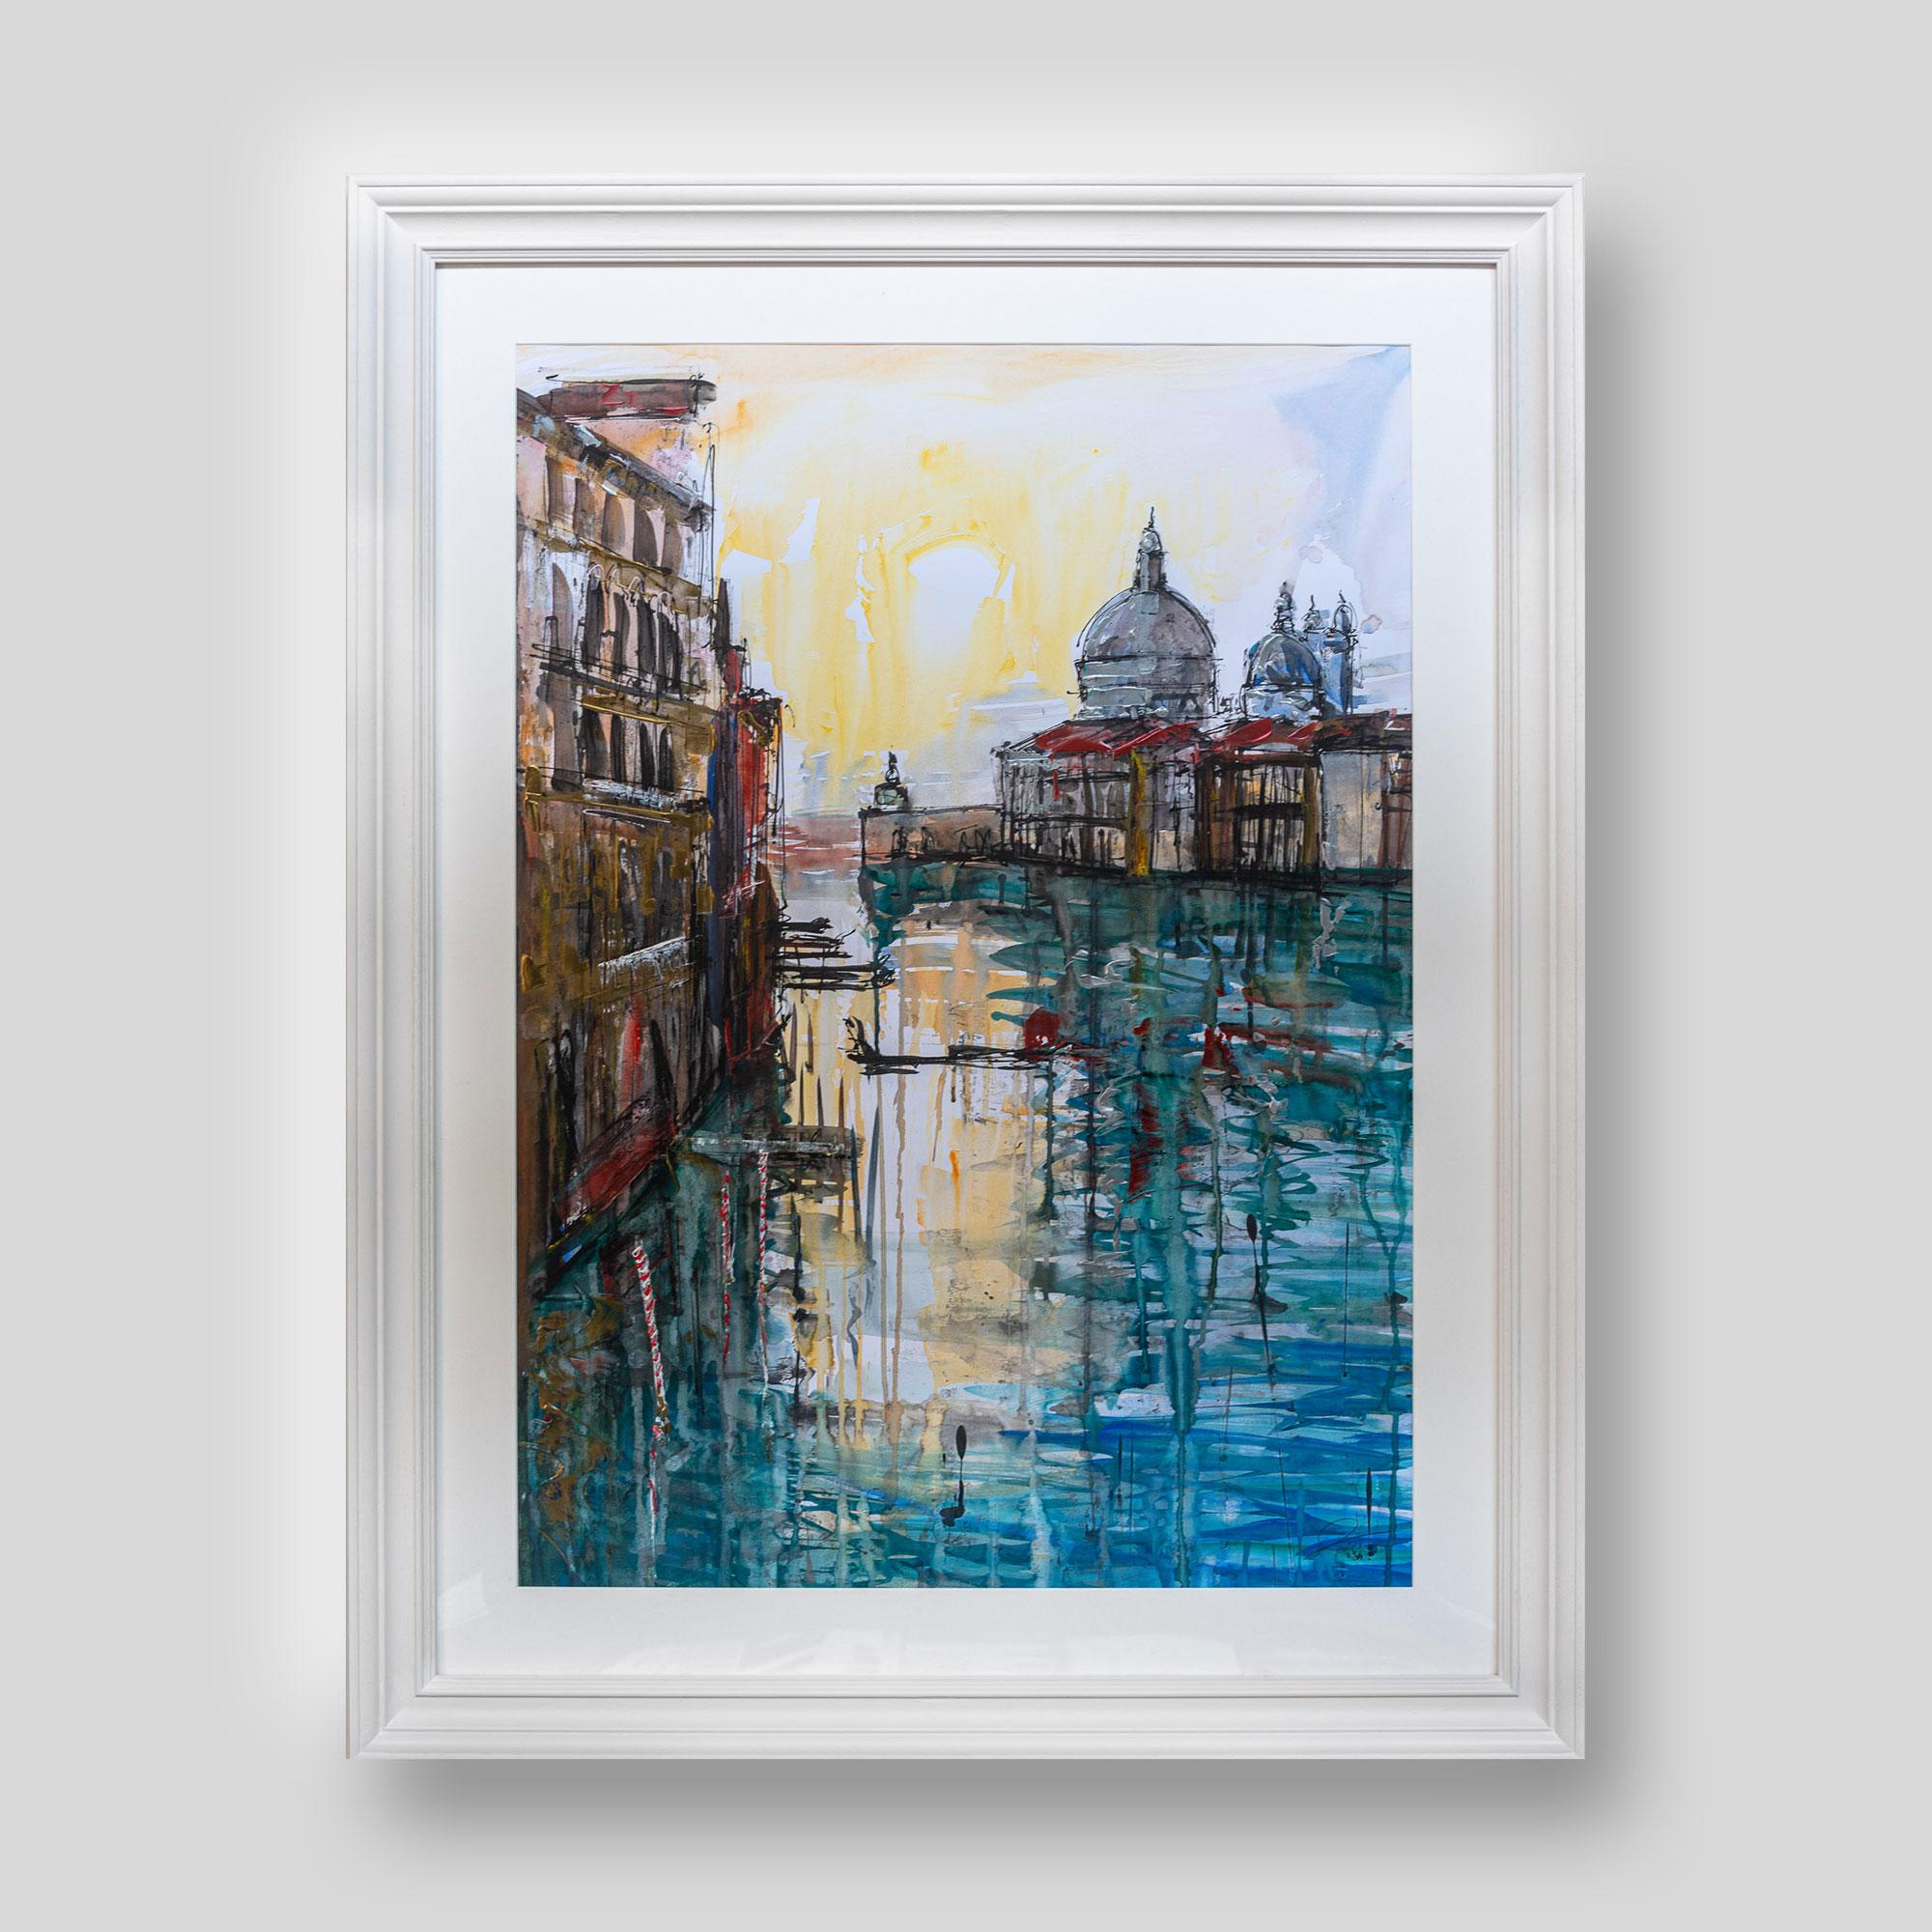 Gondola Travel - Original Venice Gondola Painting by UK Contemporary Cityscape Artist Paul Kenton, from the Watercolour Collection